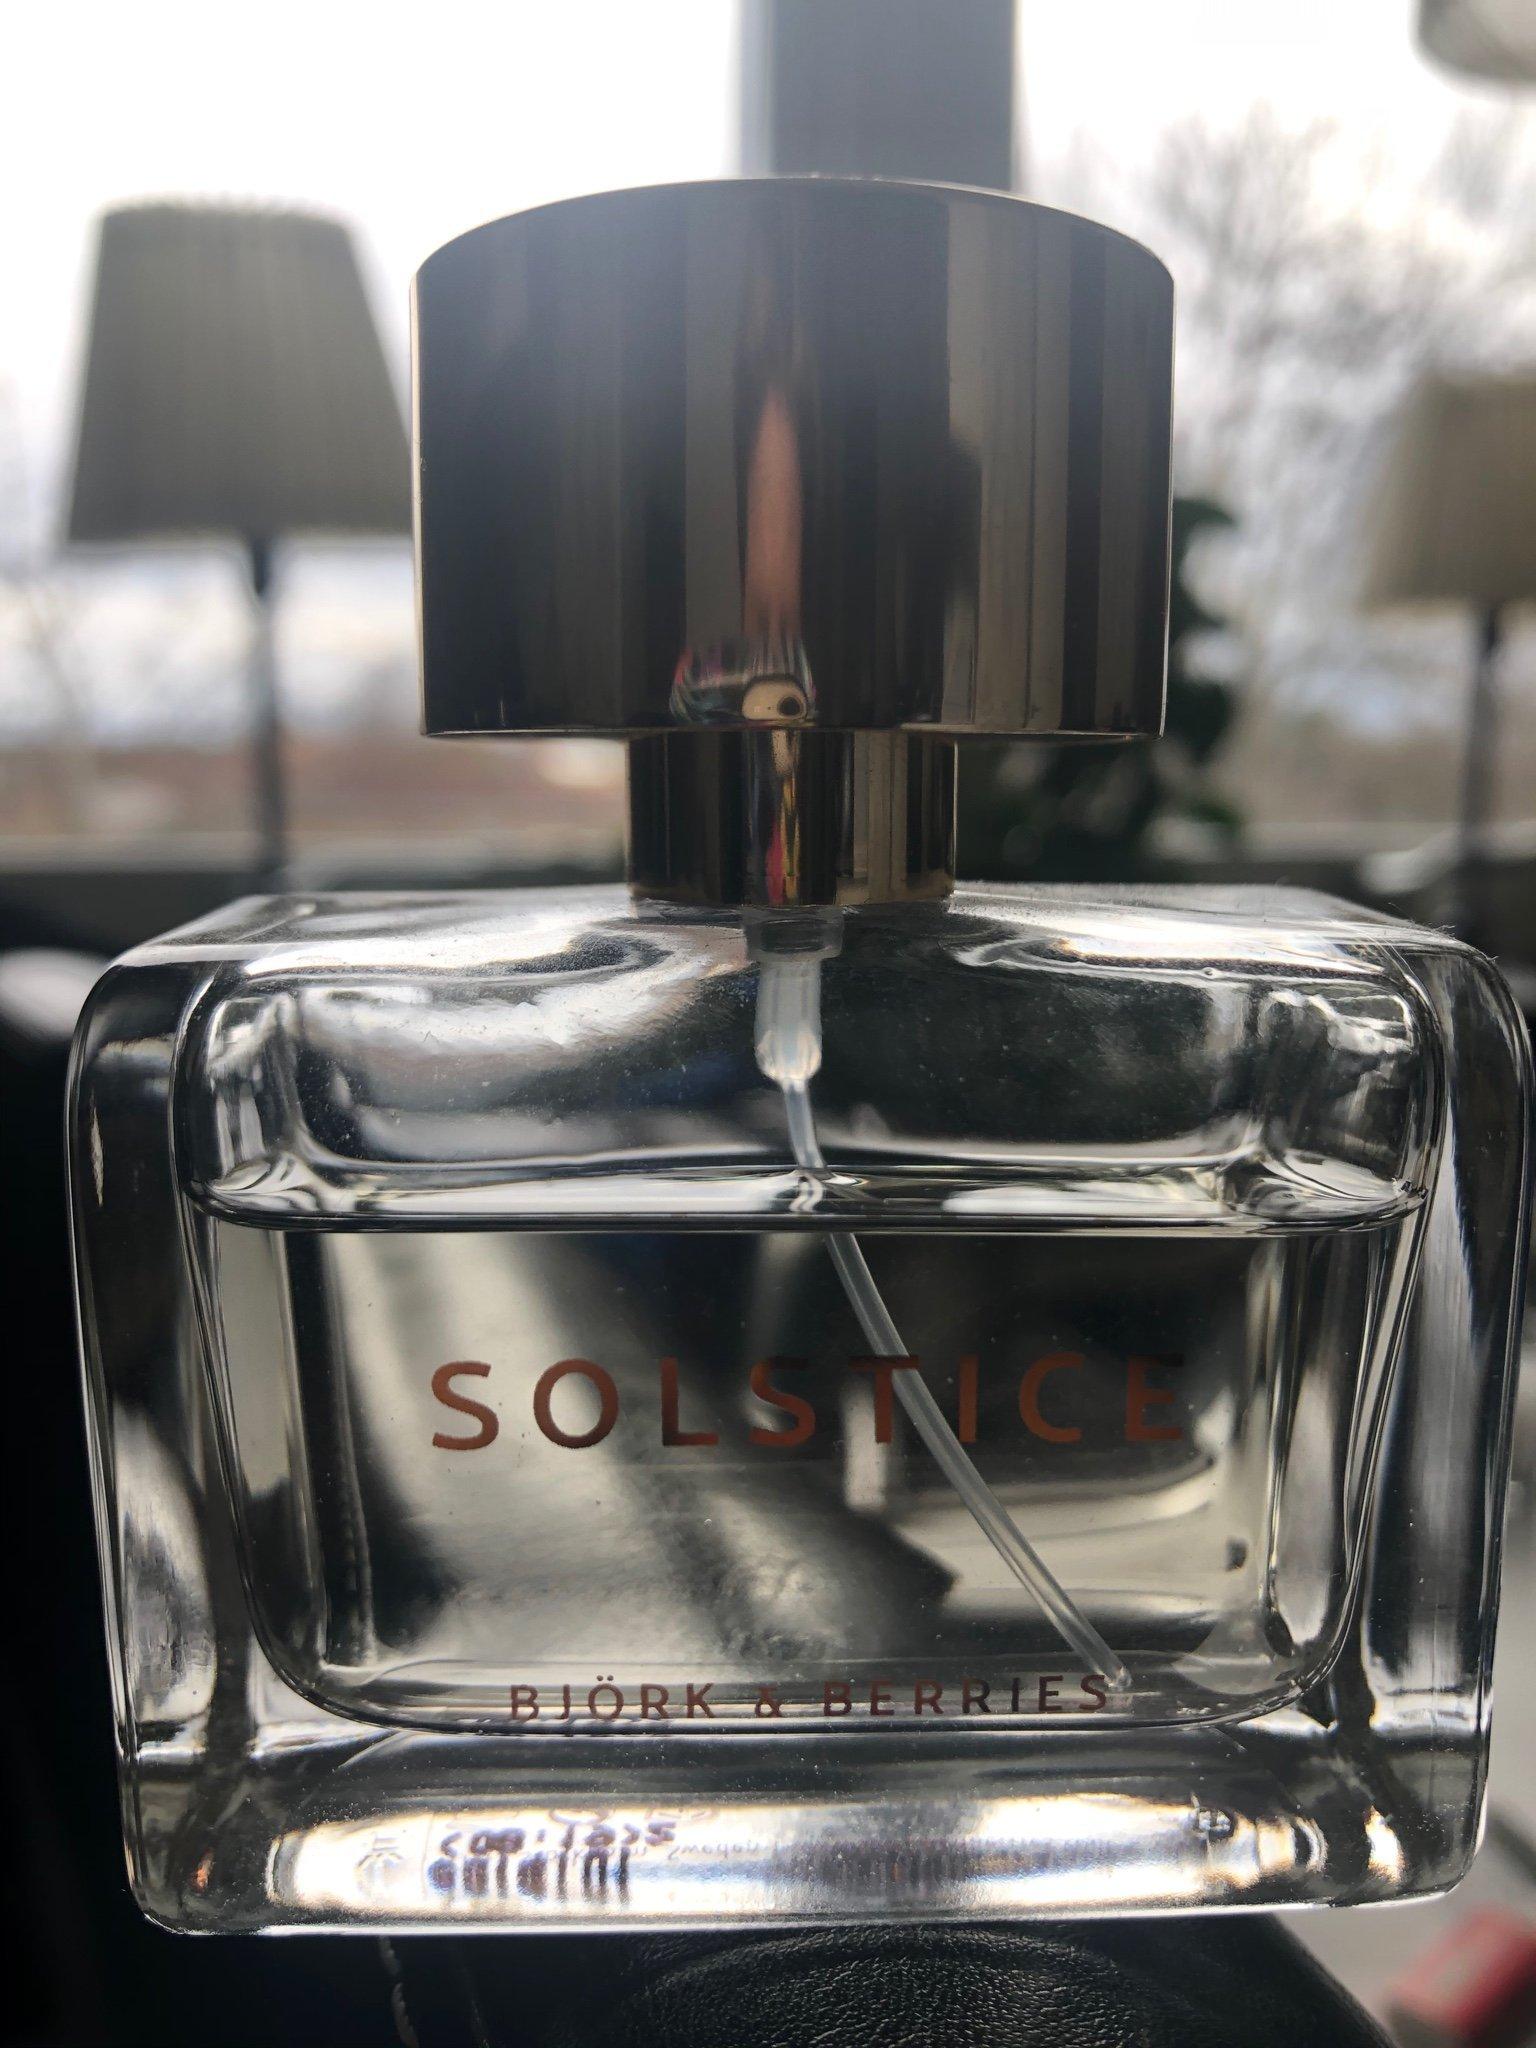 Björk and Berries Solstice 50ml (390430746) ᐈ Köp på Tradera